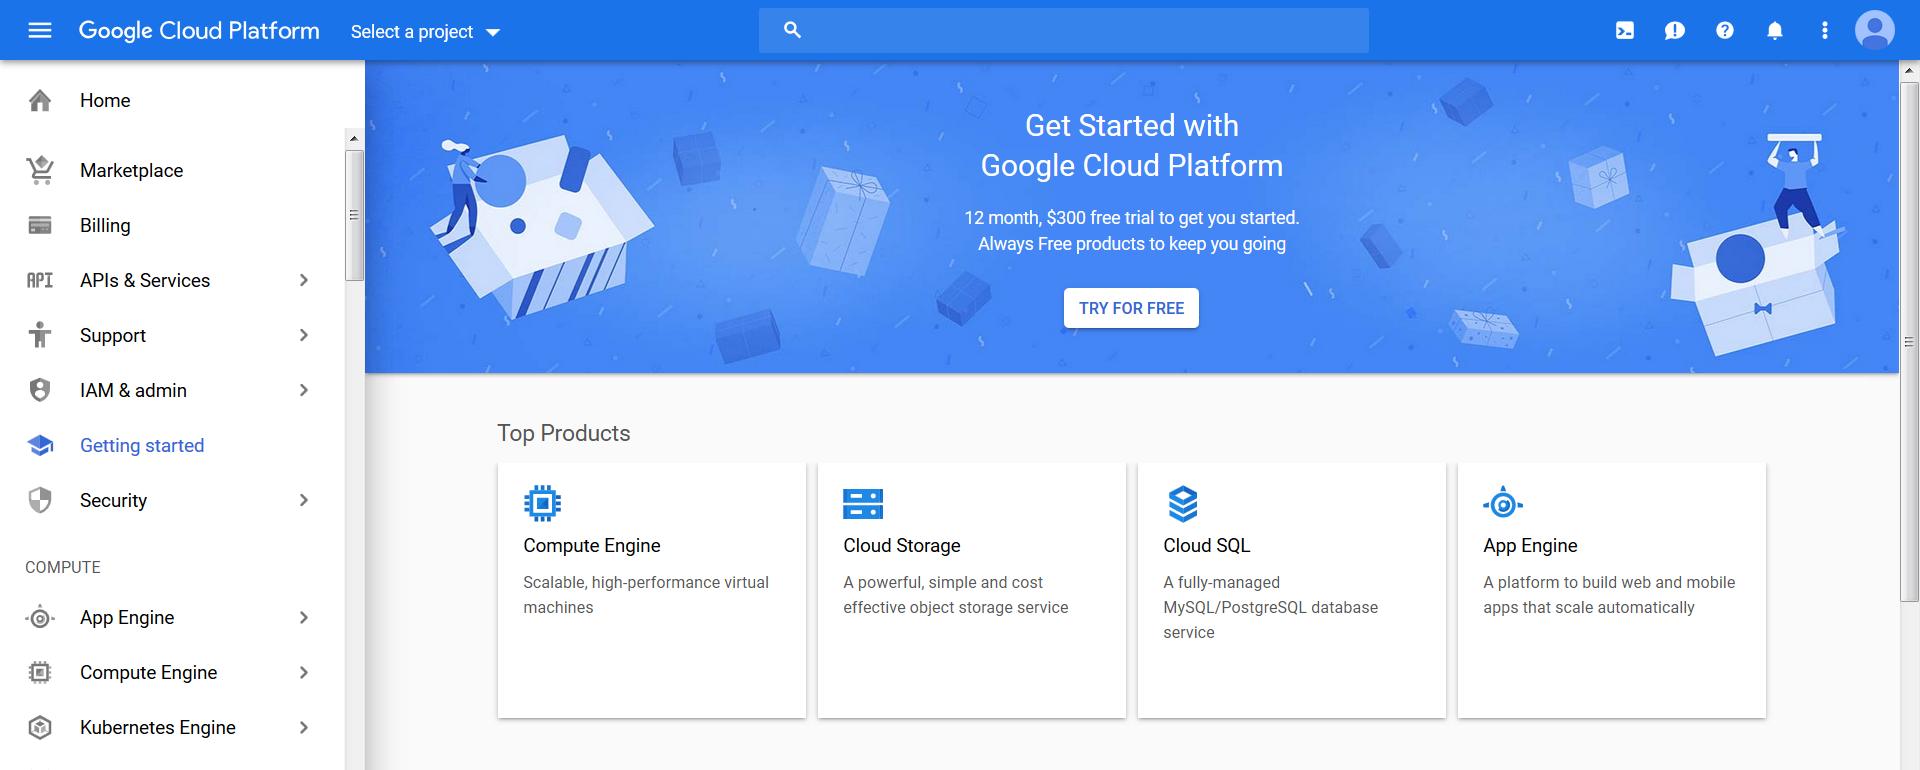 Migration to Google Cloud